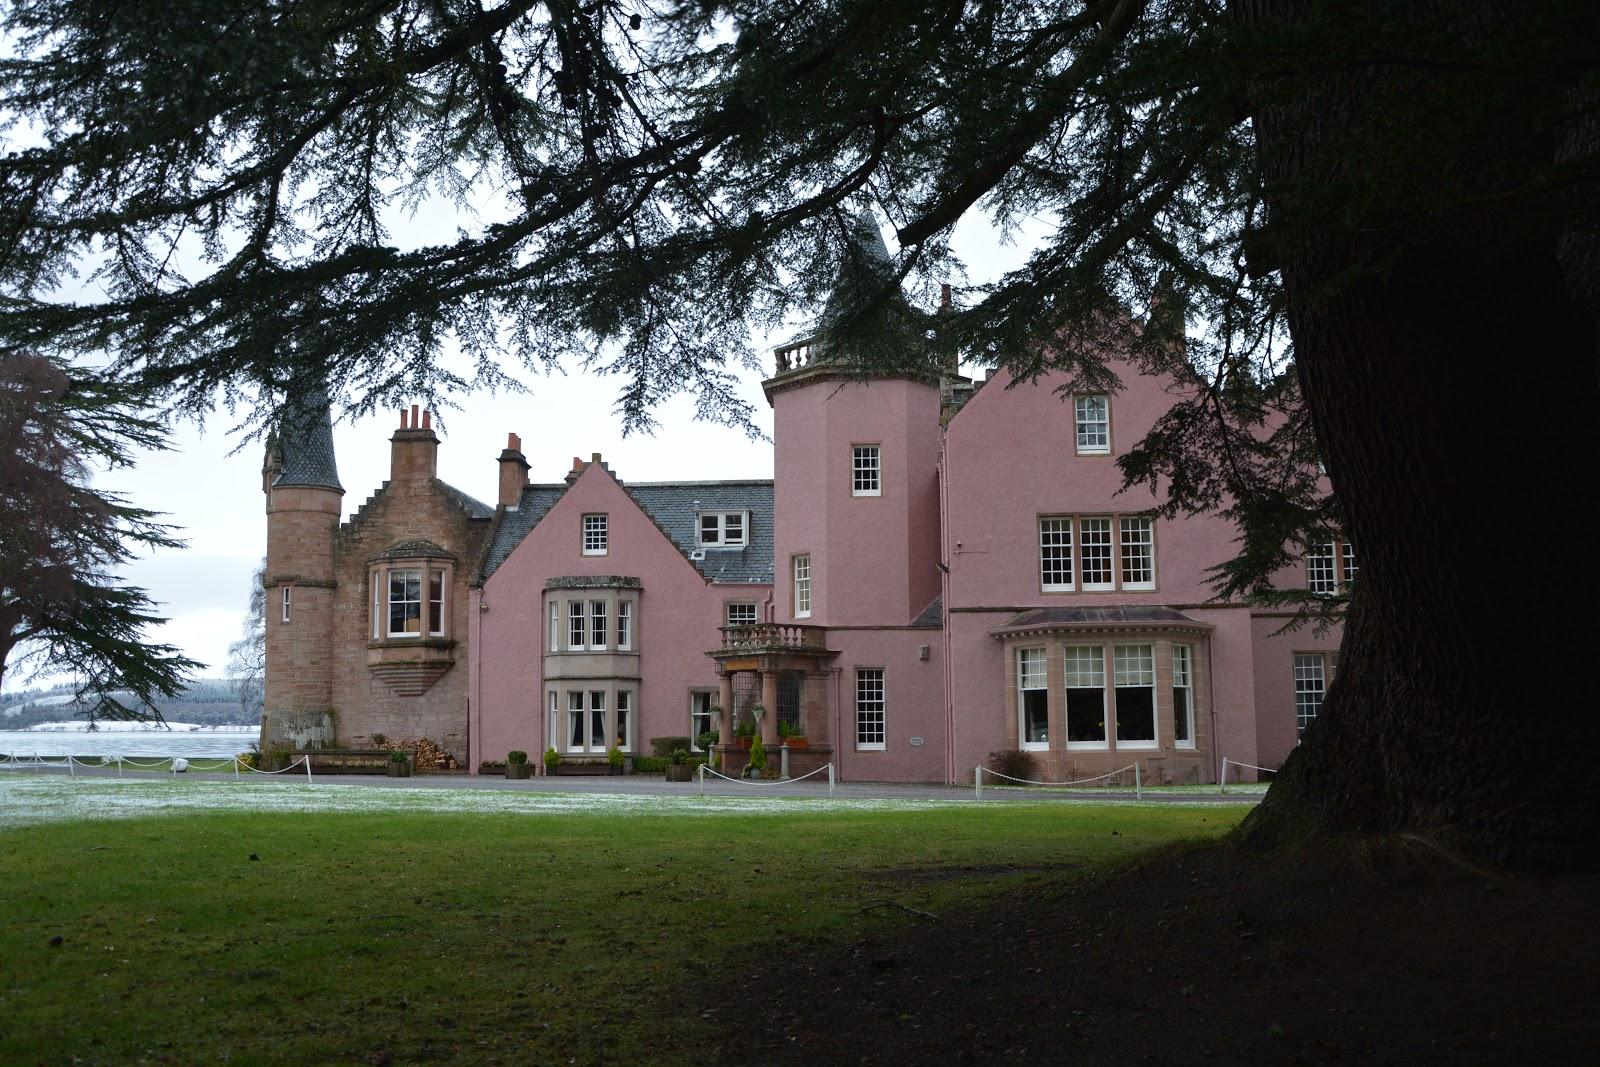 Castle Sofa House Of Fraser T Cushion Slipcovers For Sofas Bunchrew Solveig In Scotland